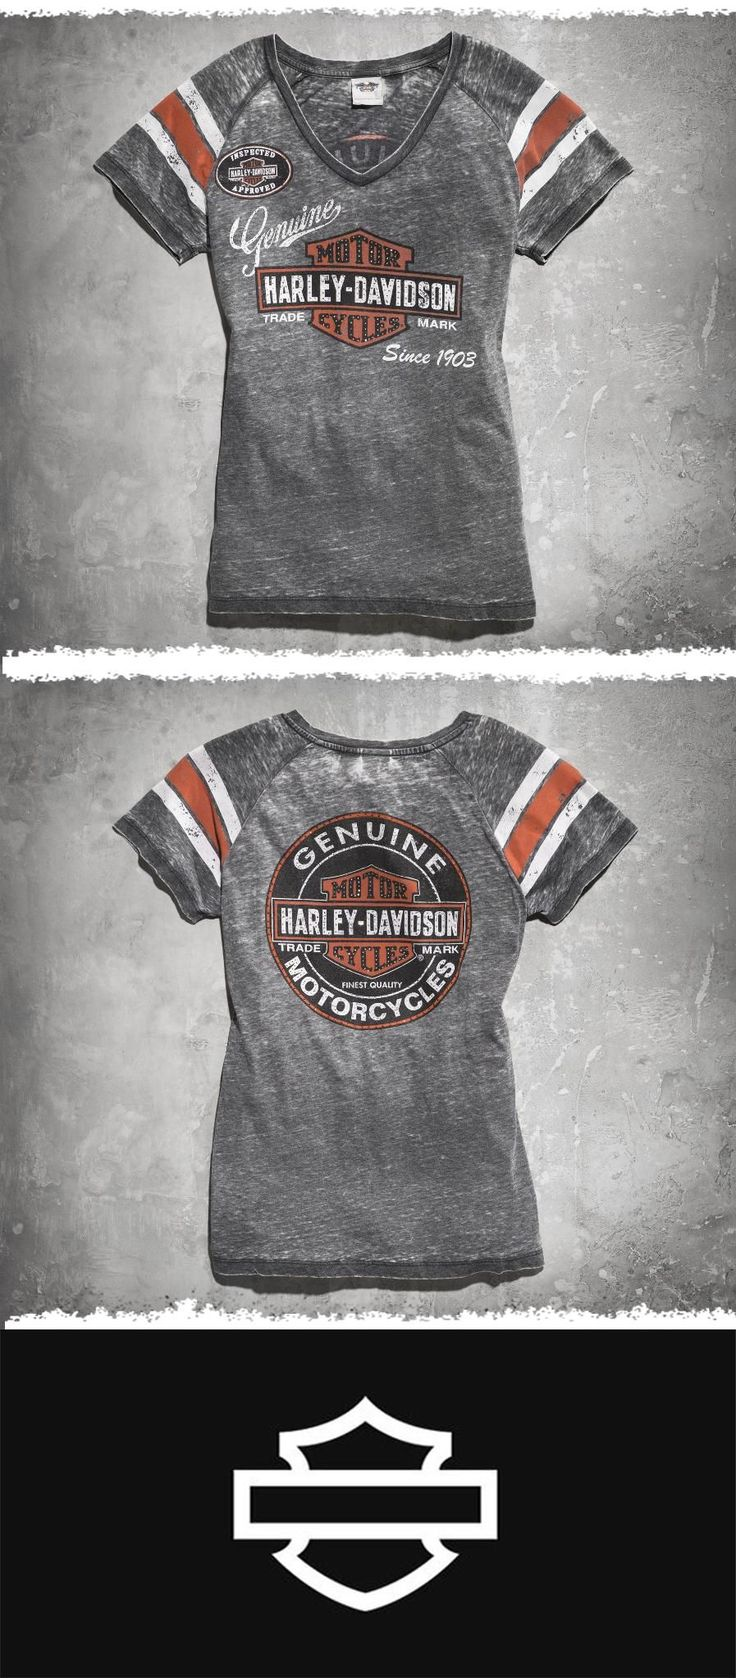 Love the worn look? Go retro. | Harley-Davidson Women's Genuine Oil Can Burnout Tee #MothersDay #harleydavidsongirlsclothes